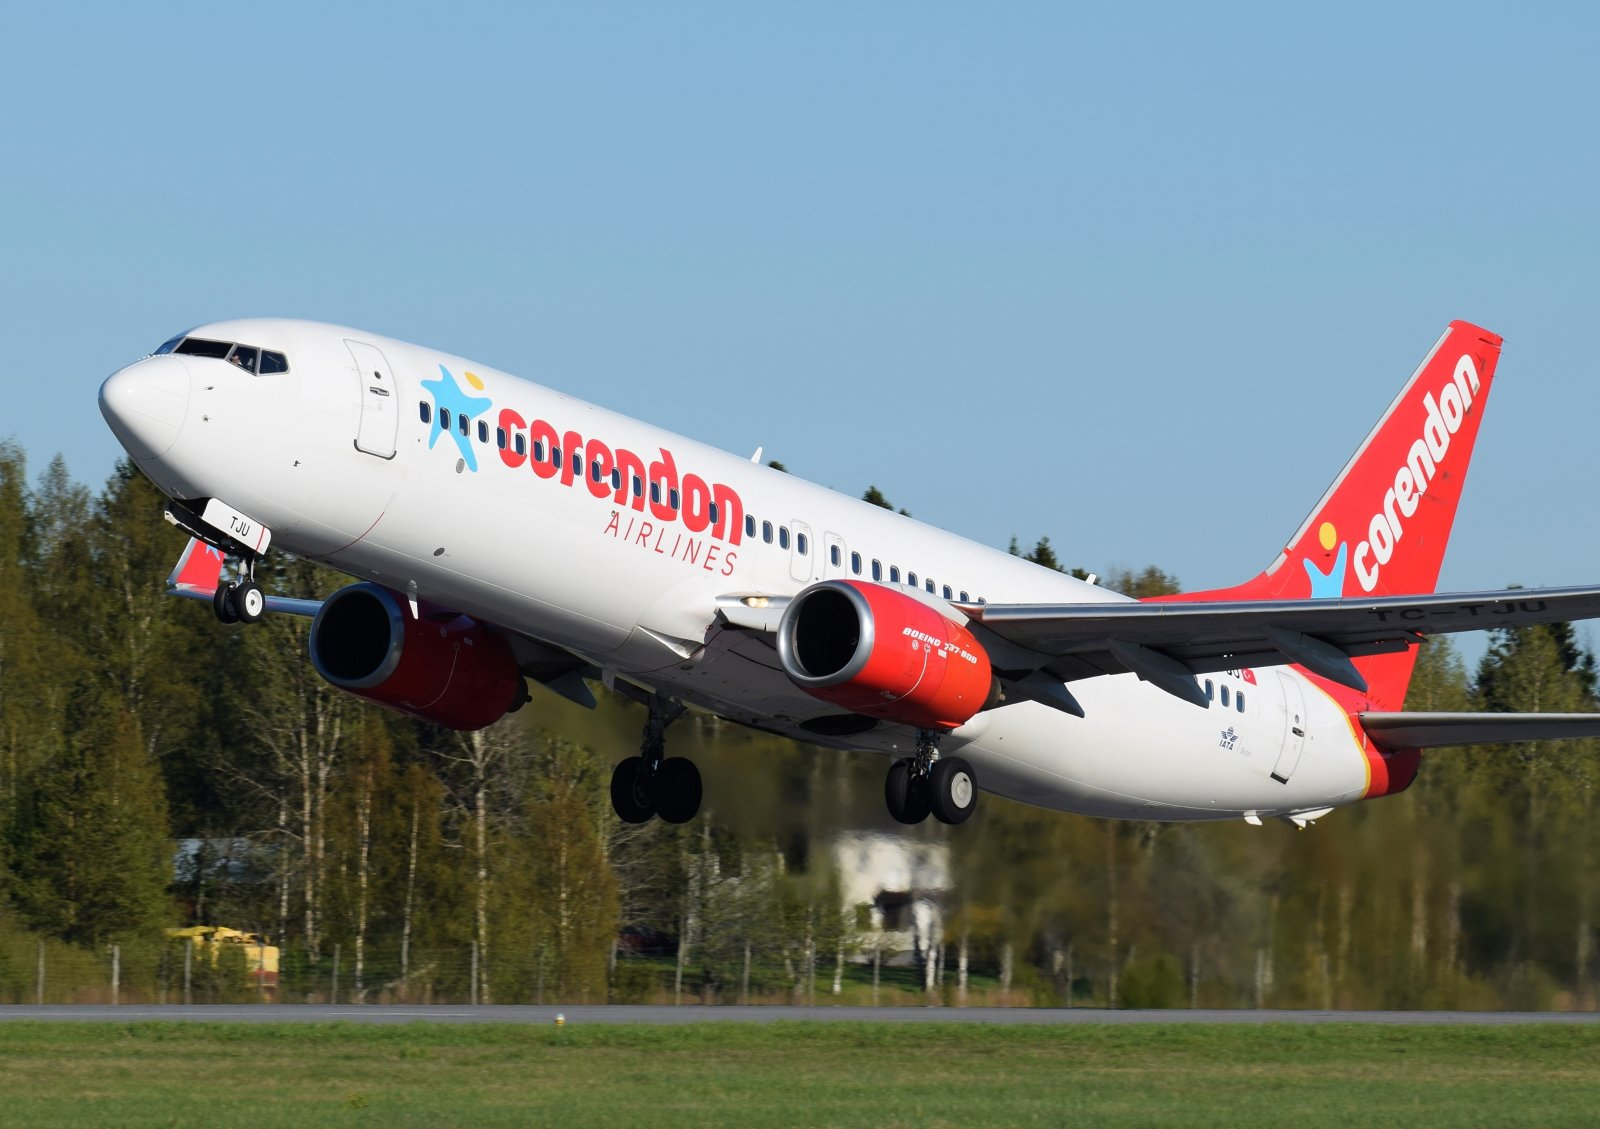 TC-TJU - Boeing 737-8HX - Corendon Airlines - 17.5.2019